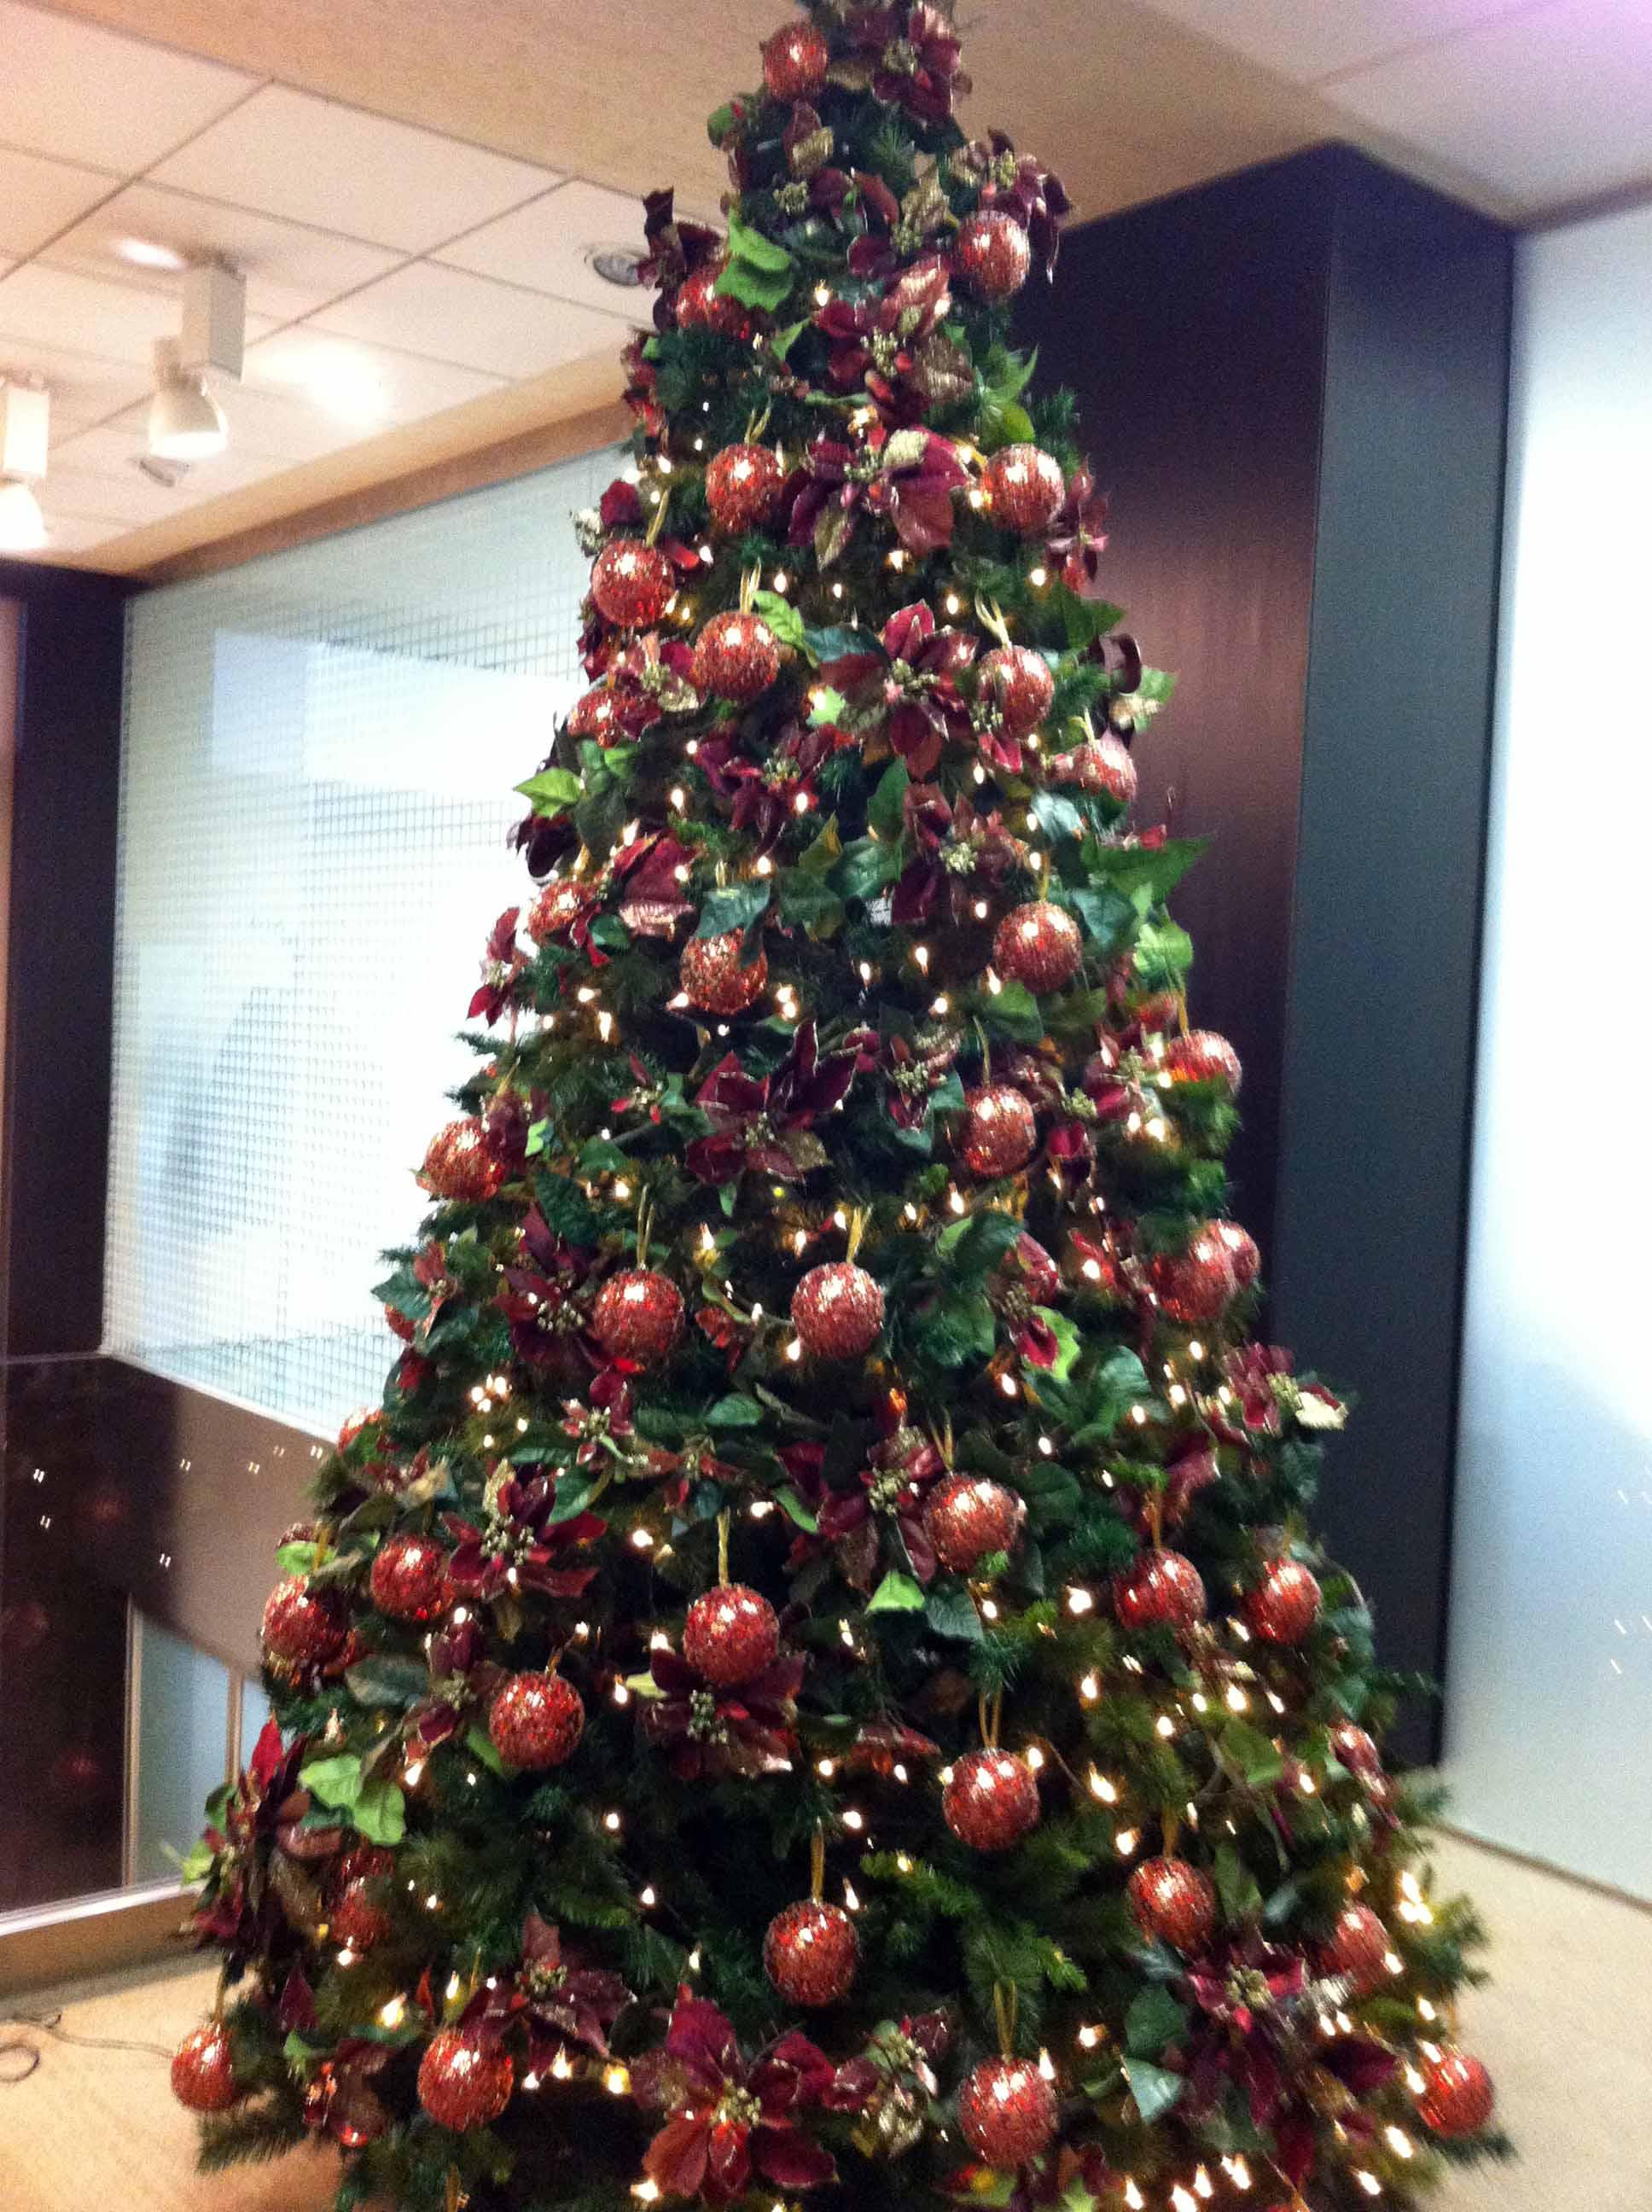 Rboles navidad color marr n b m rboles de navidad - Arbol de navidad exterior ...